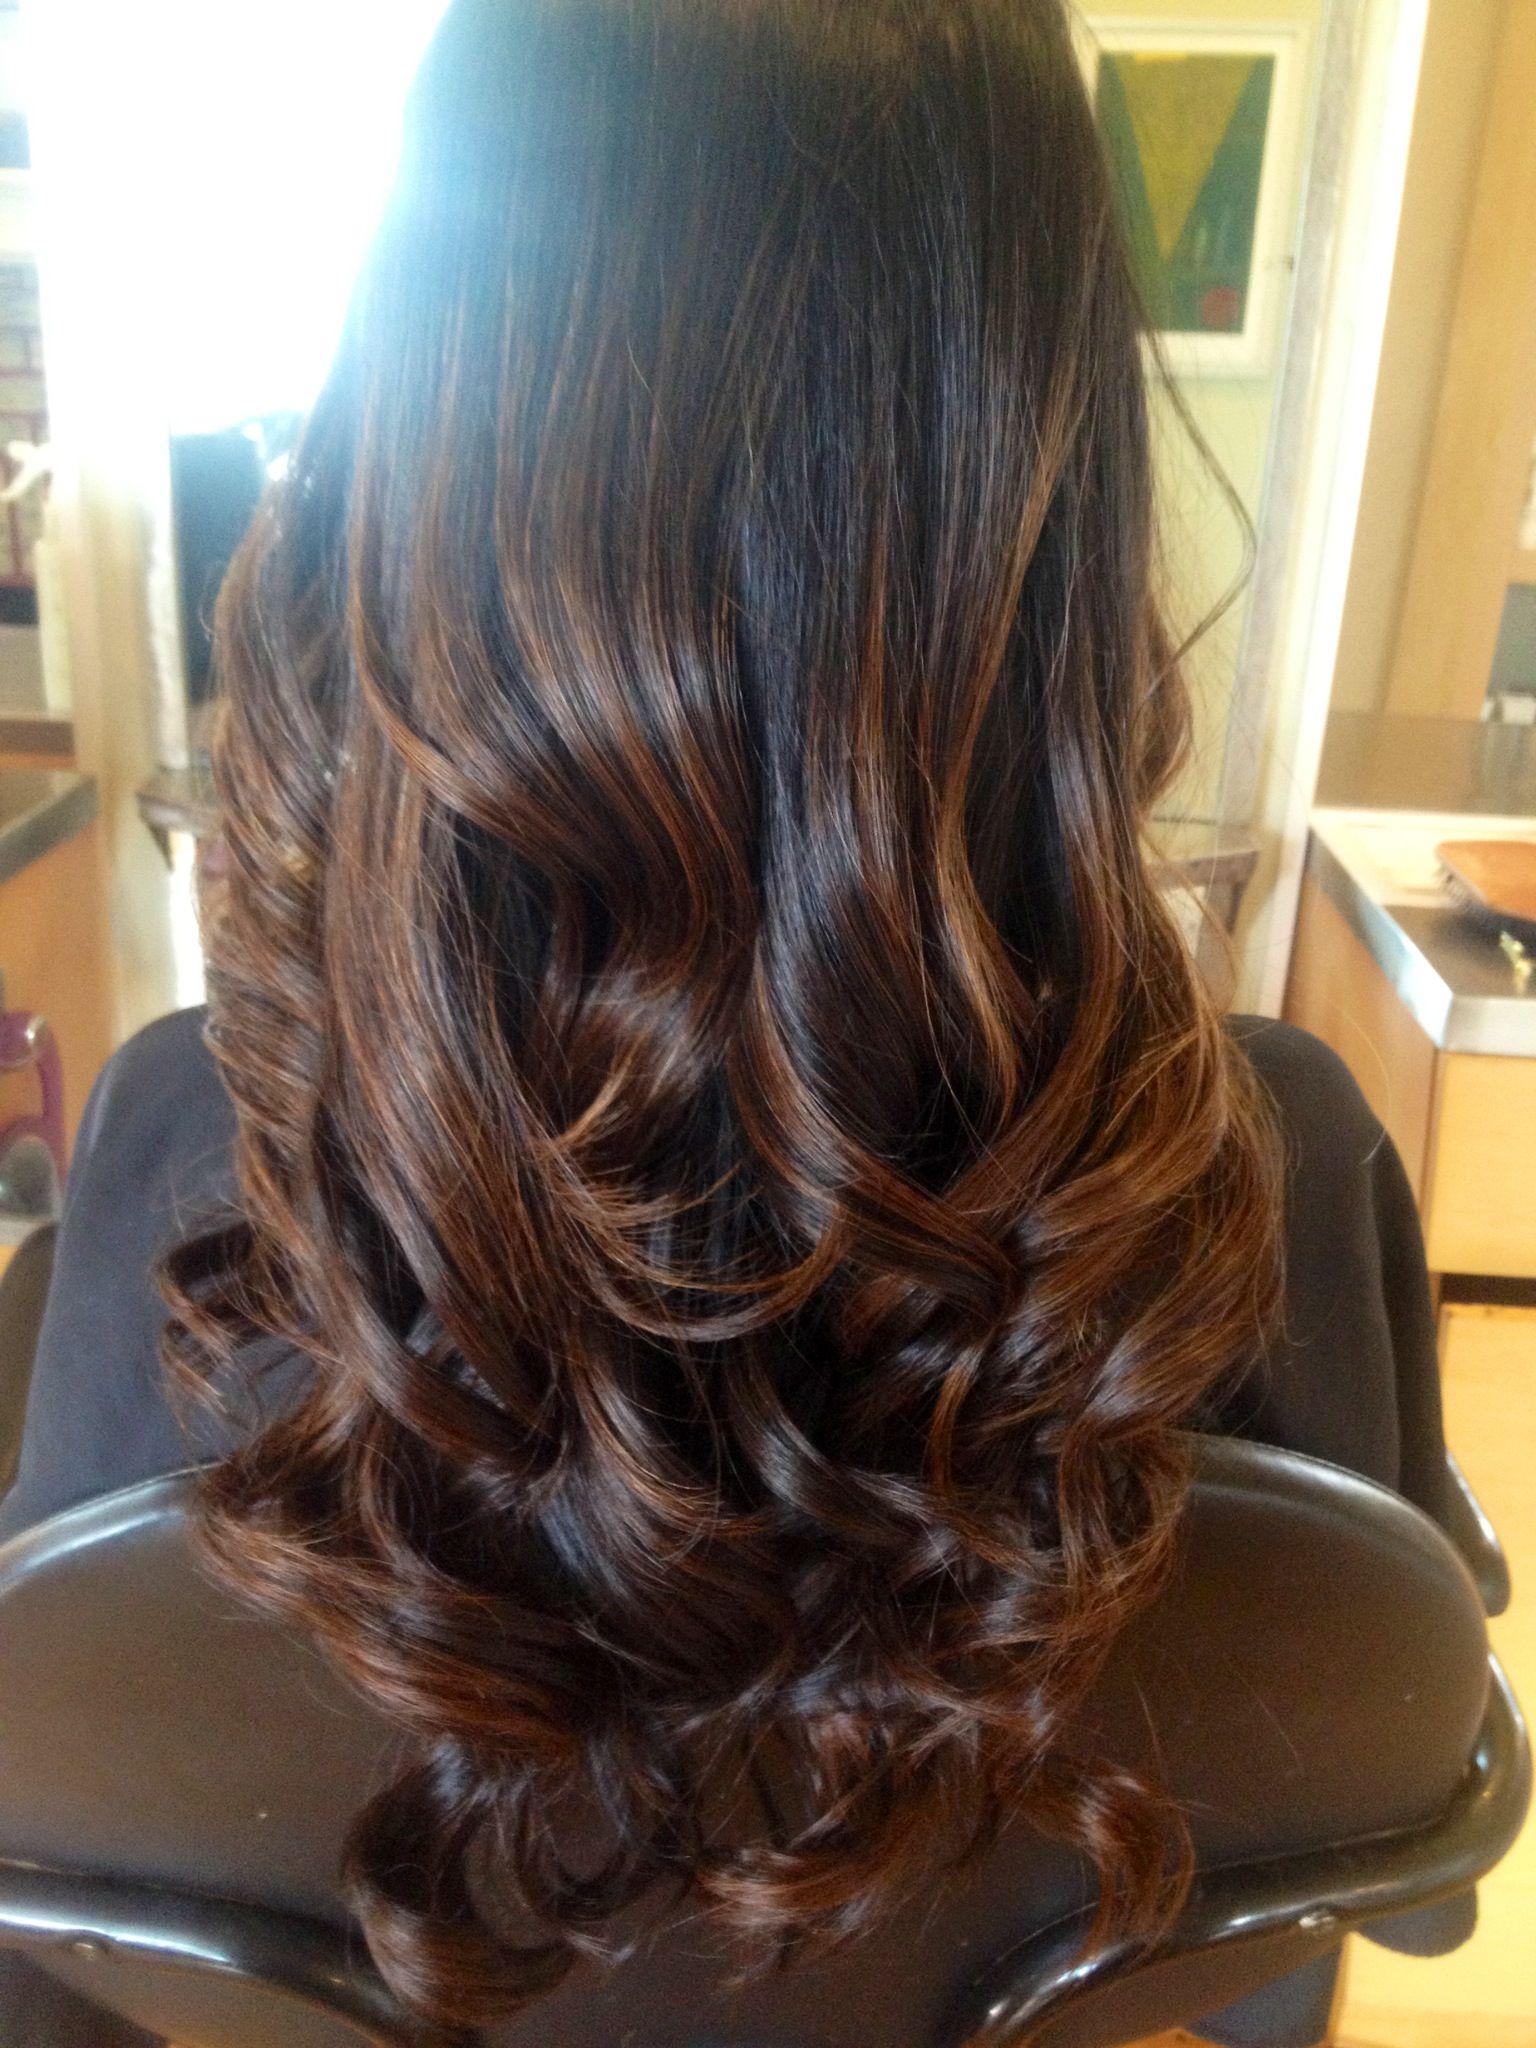 Brunette ombre hair styles colors pinterest - Ombre hair brune ...